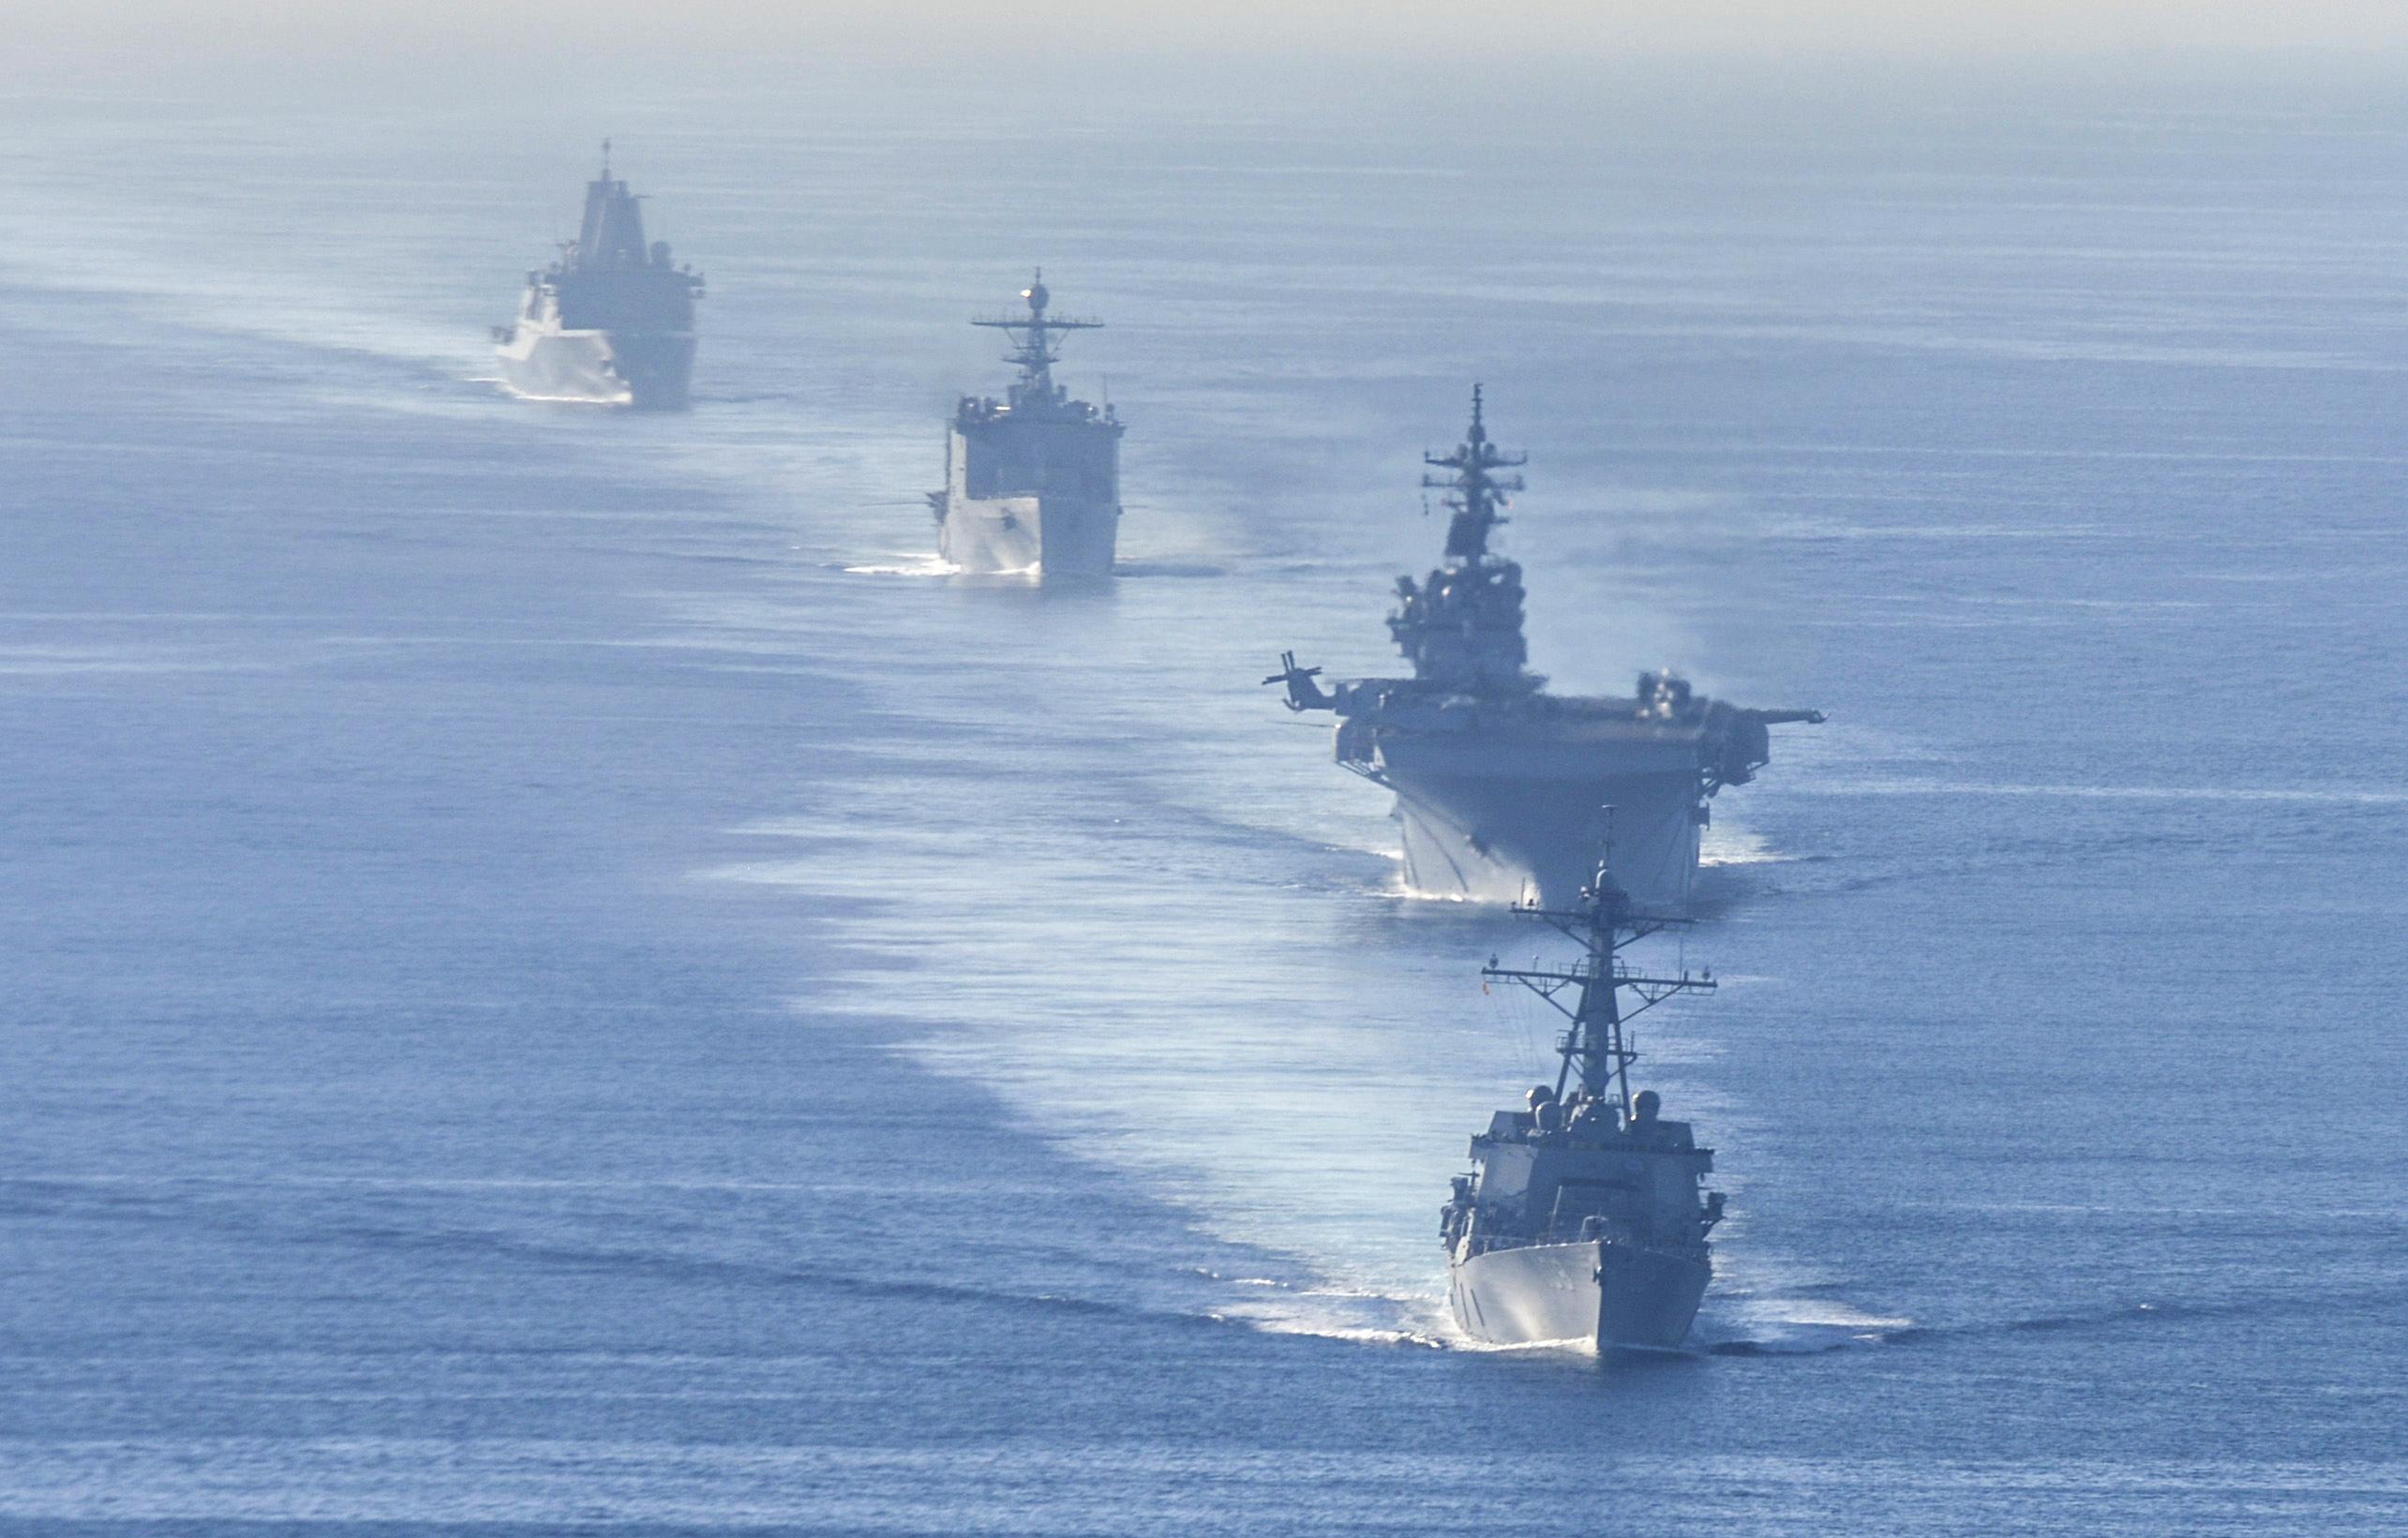 Commander, U.S. Pacific Fleet      Exercise Dawn Blitz concludes, setting standard for new amphibious capabilities